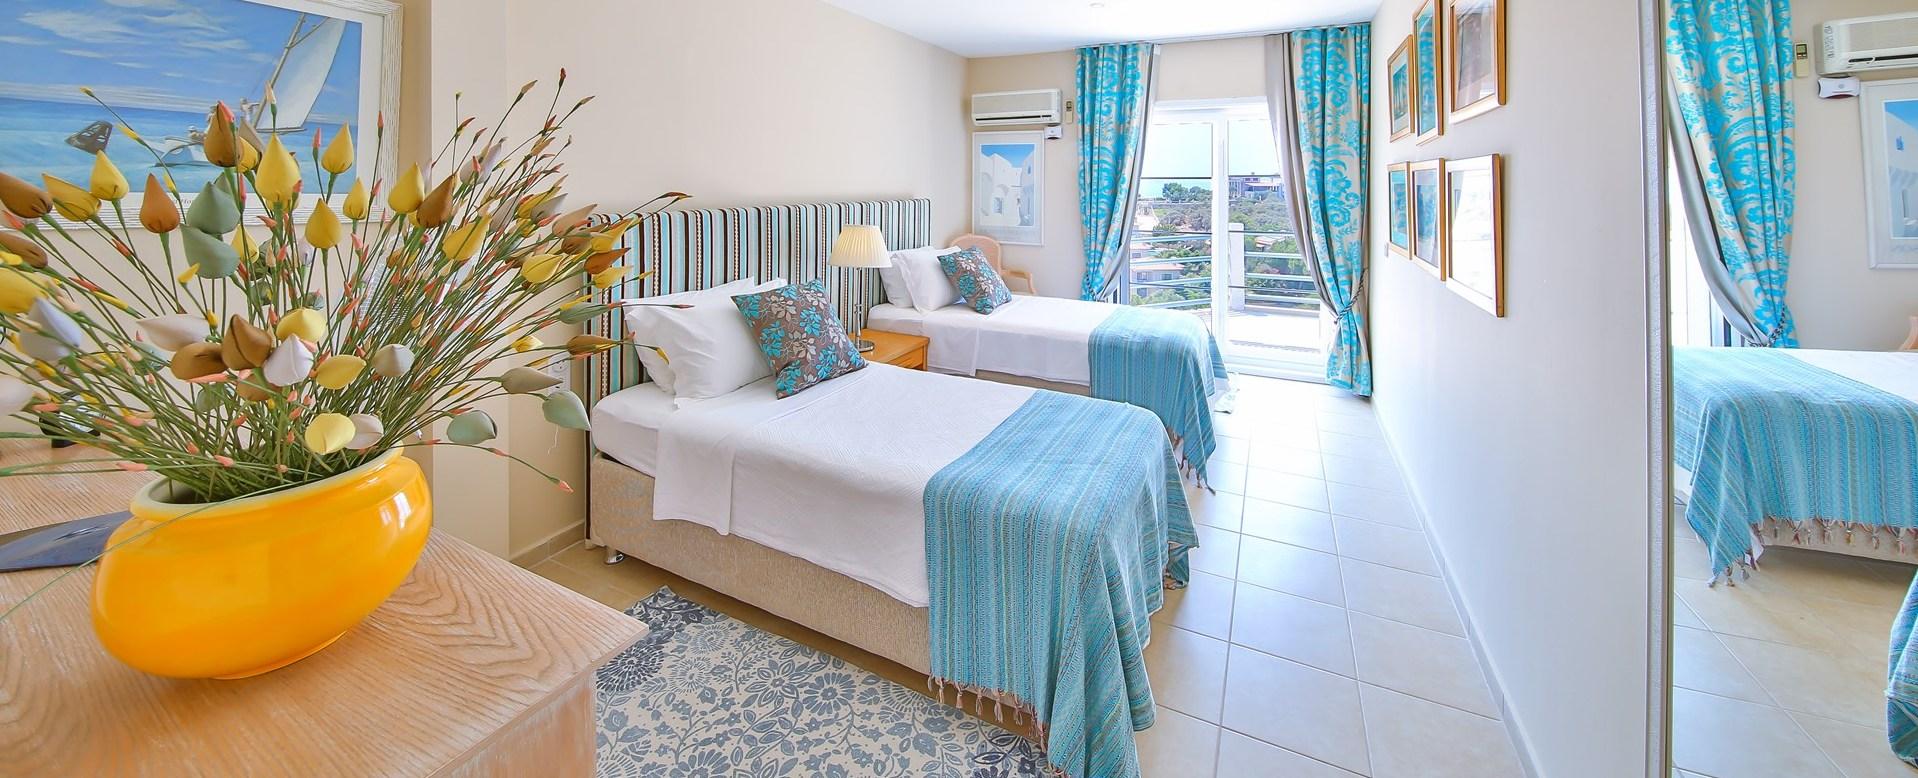 villa-kas-turkey-twin-bedroom